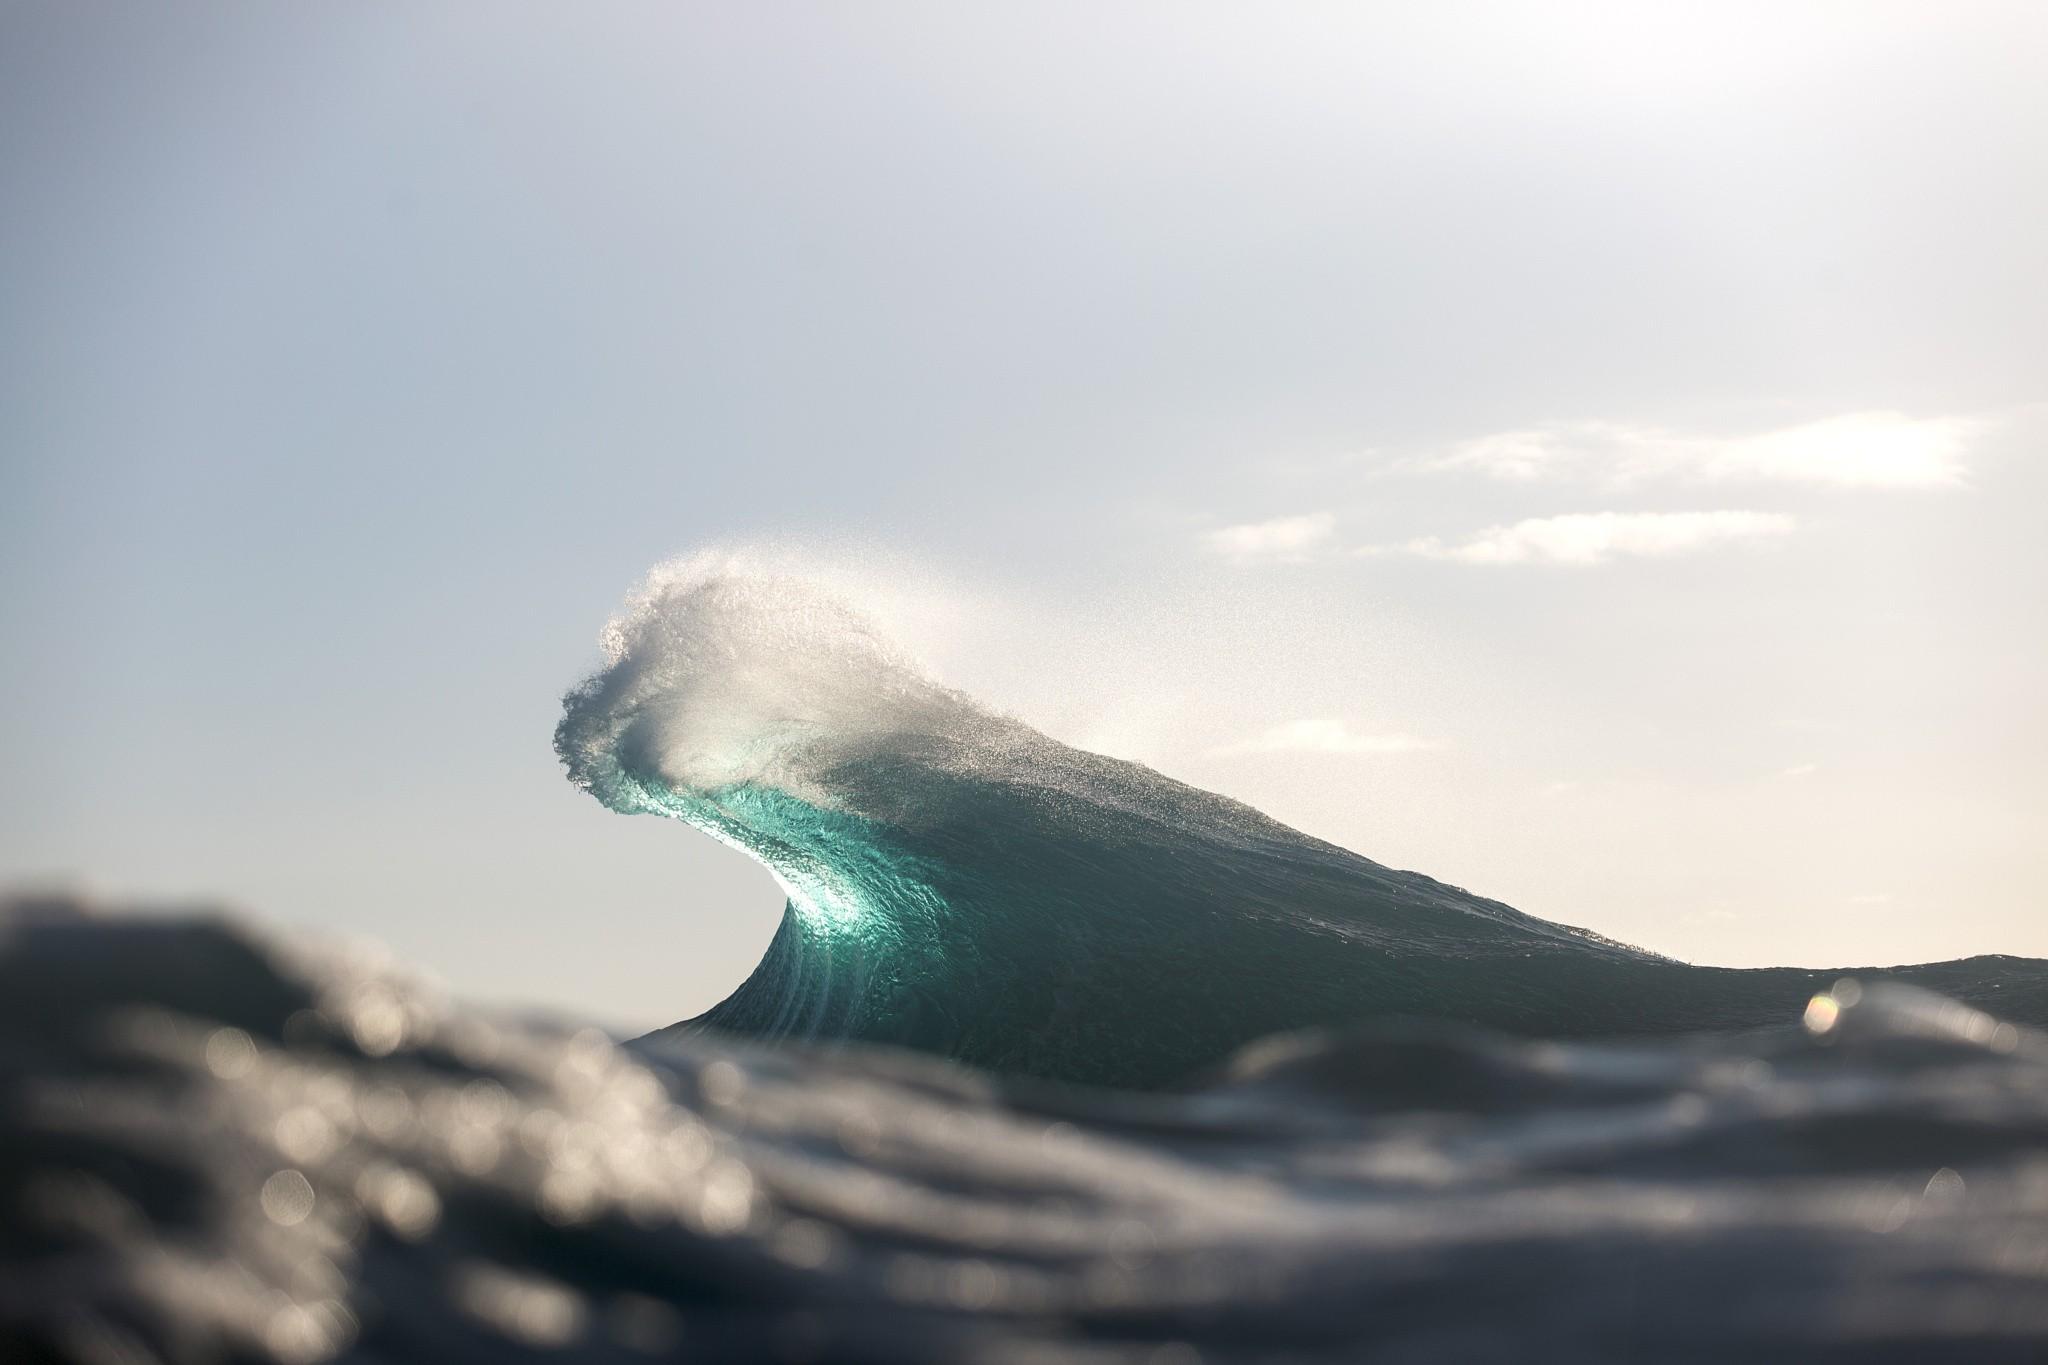 General 2048x1365 waves water sea macro bokeh depth of field atlantic ocean sunlight bright cyan clear sky turquoise